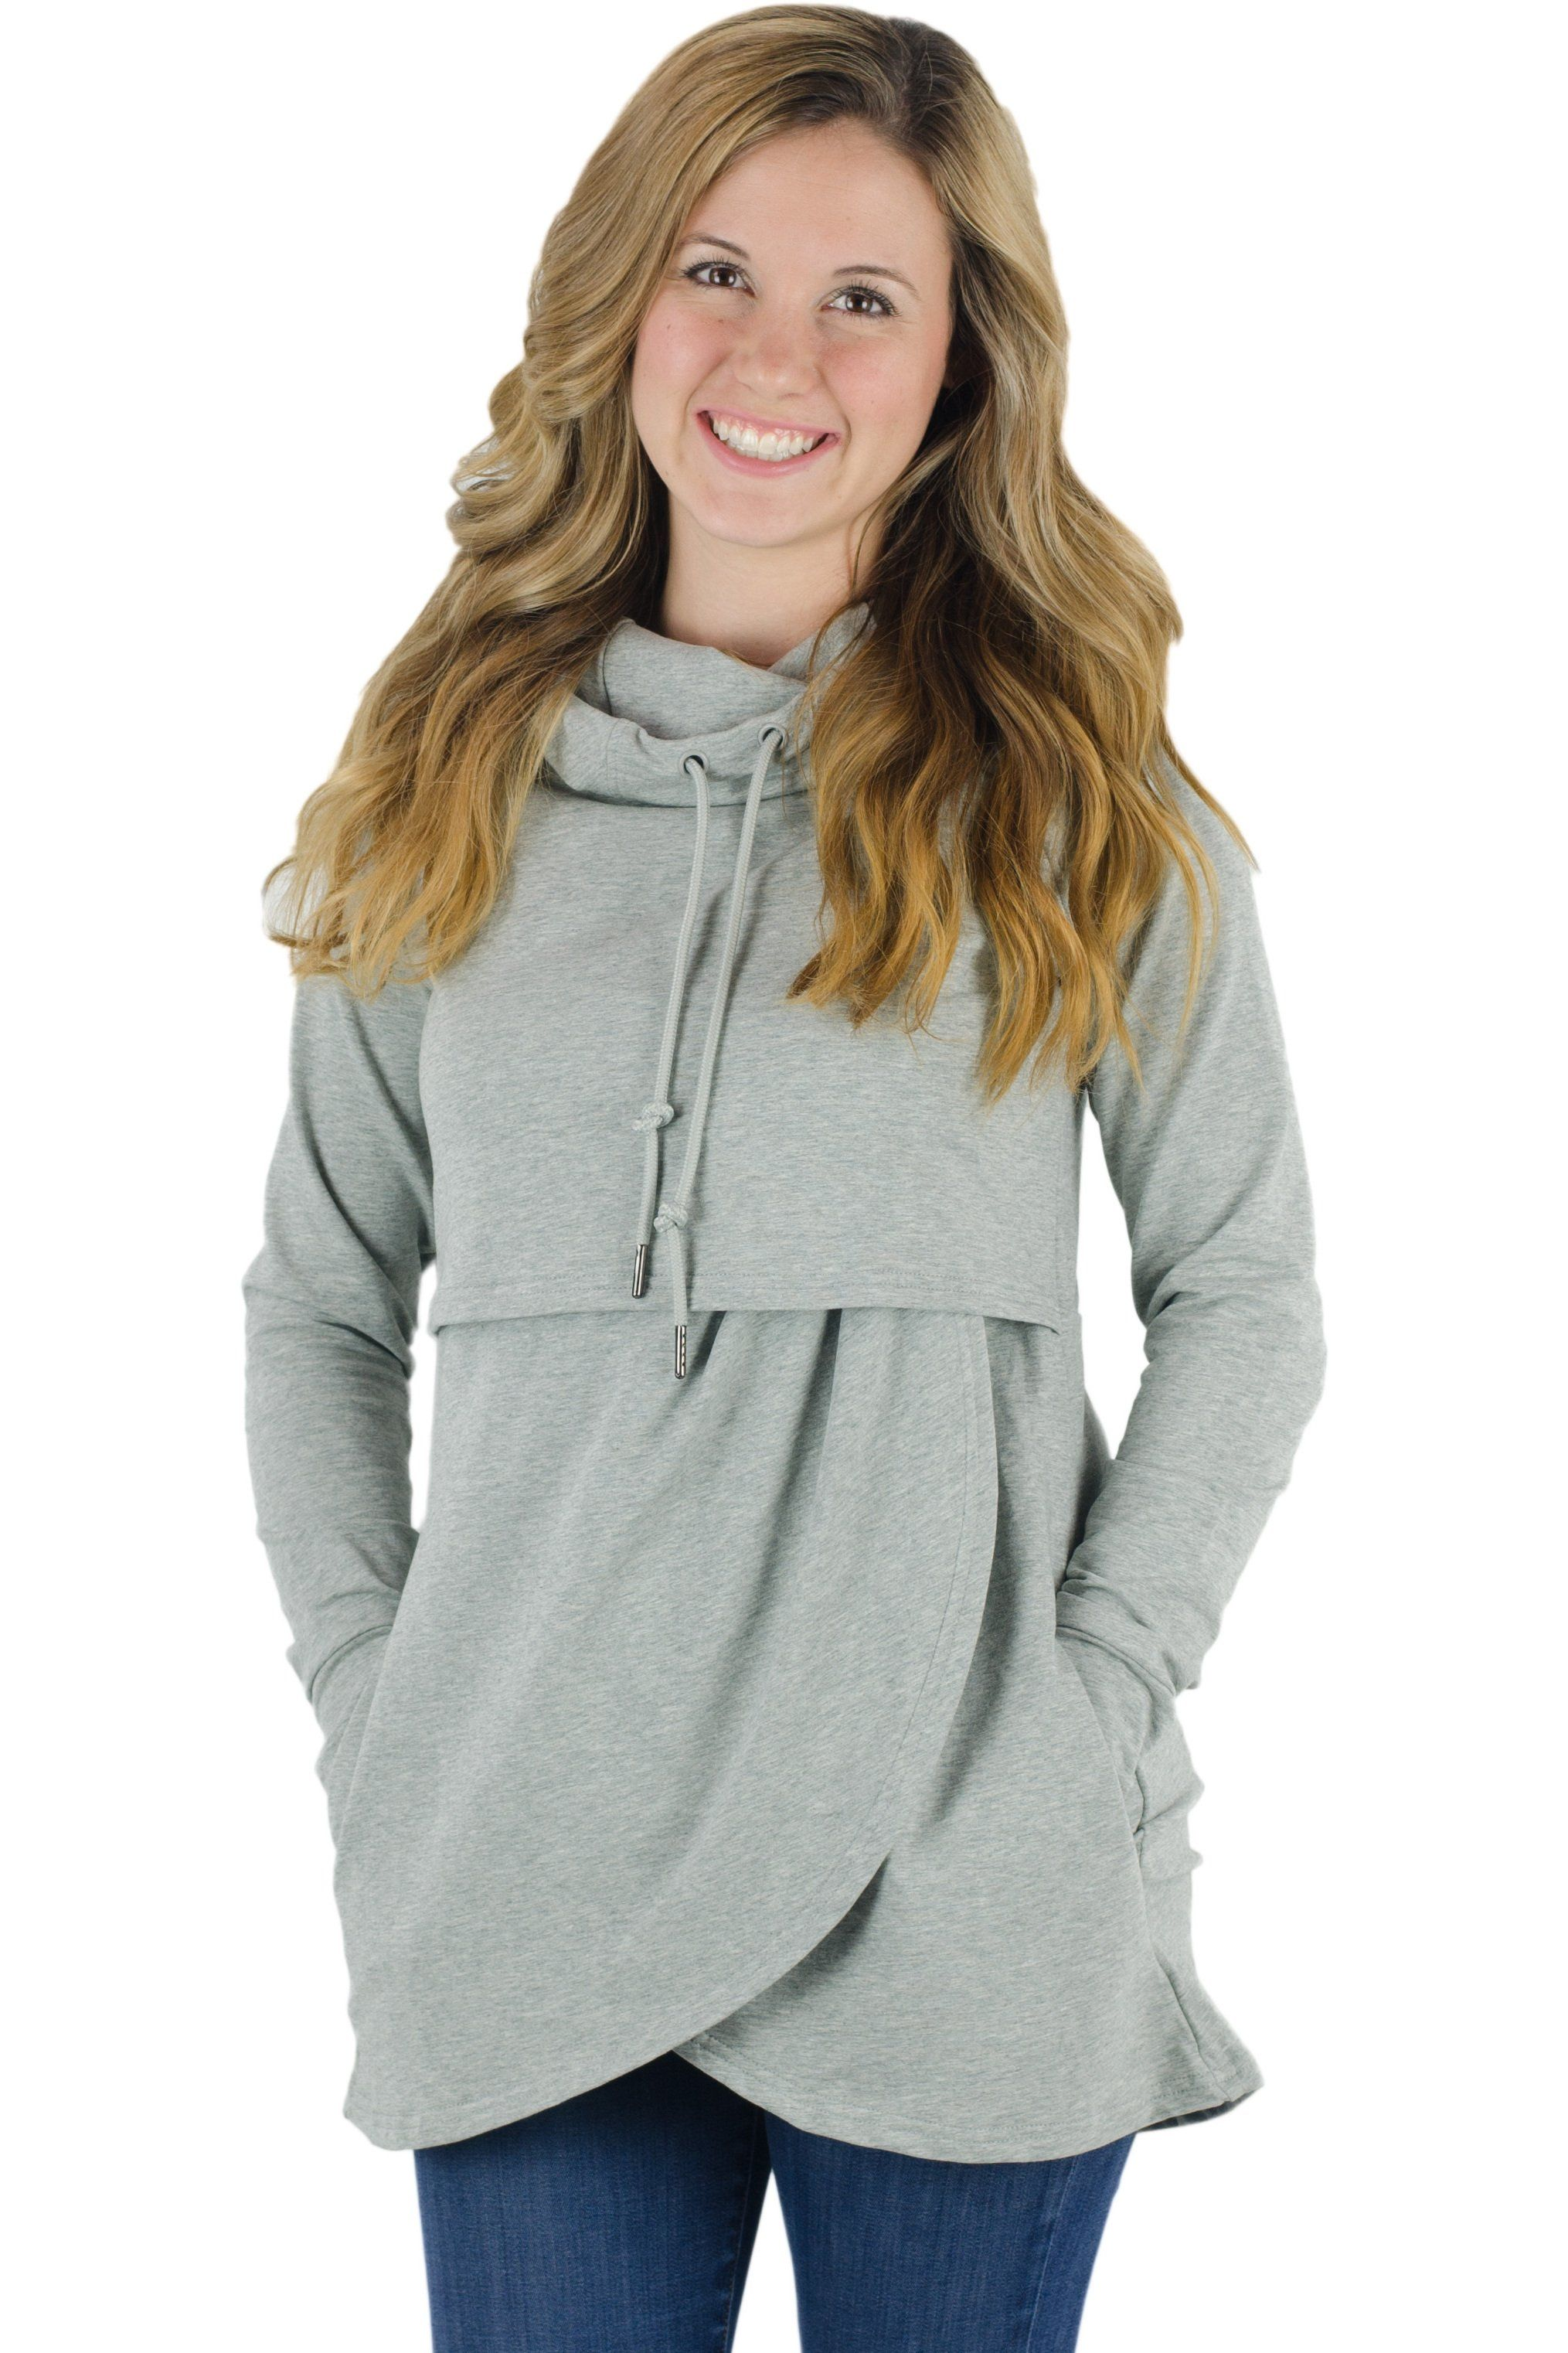 290592eb7b697 Petal Front Nursing Hoodie | Products | Nursing pajamas, Hoodies ...